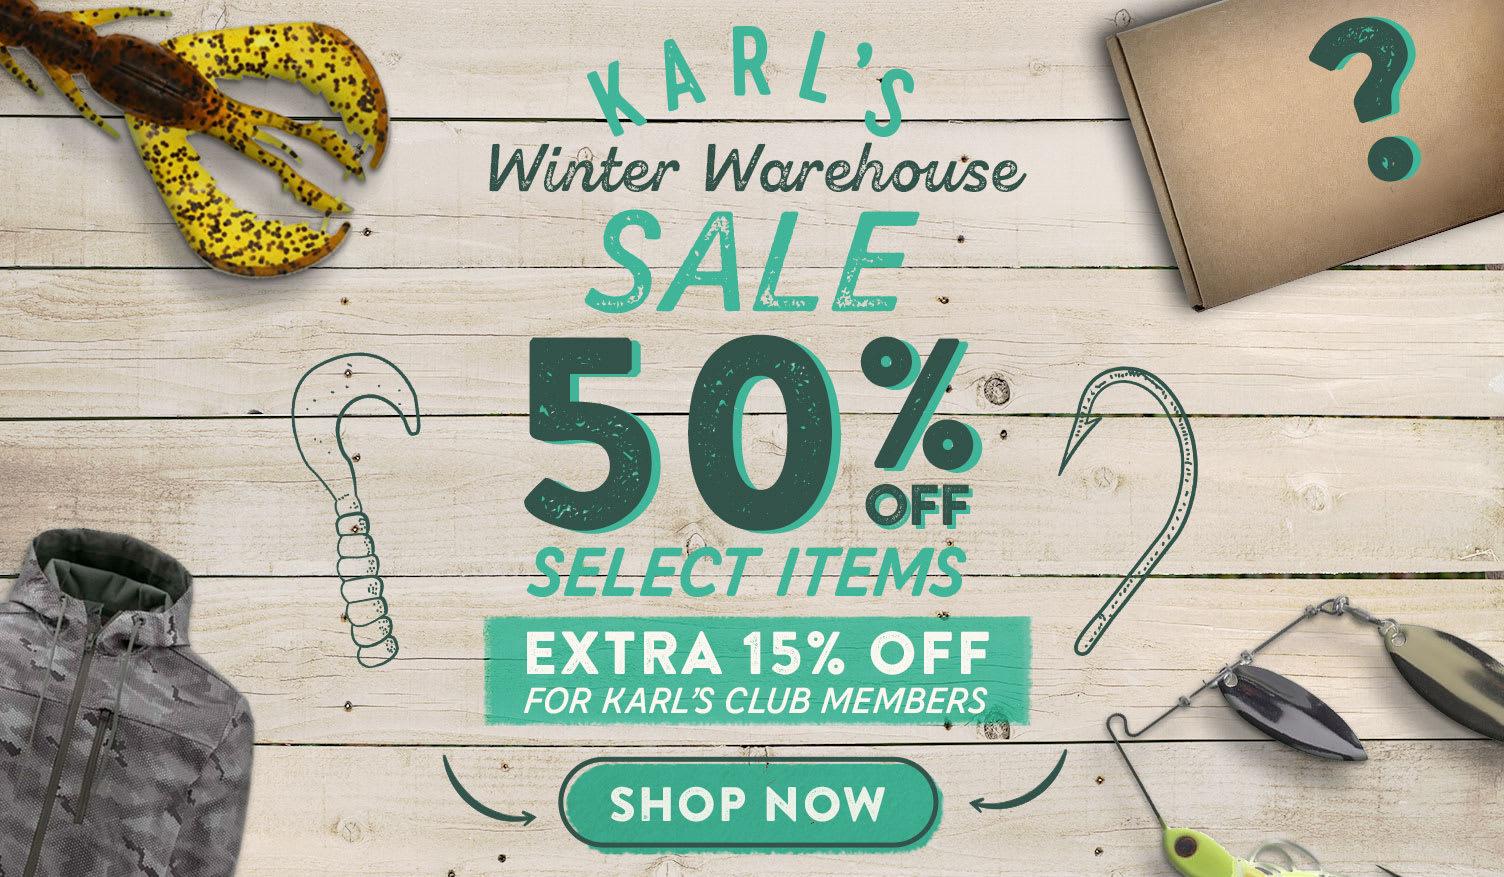 Karl's Winter Warehouse Sale